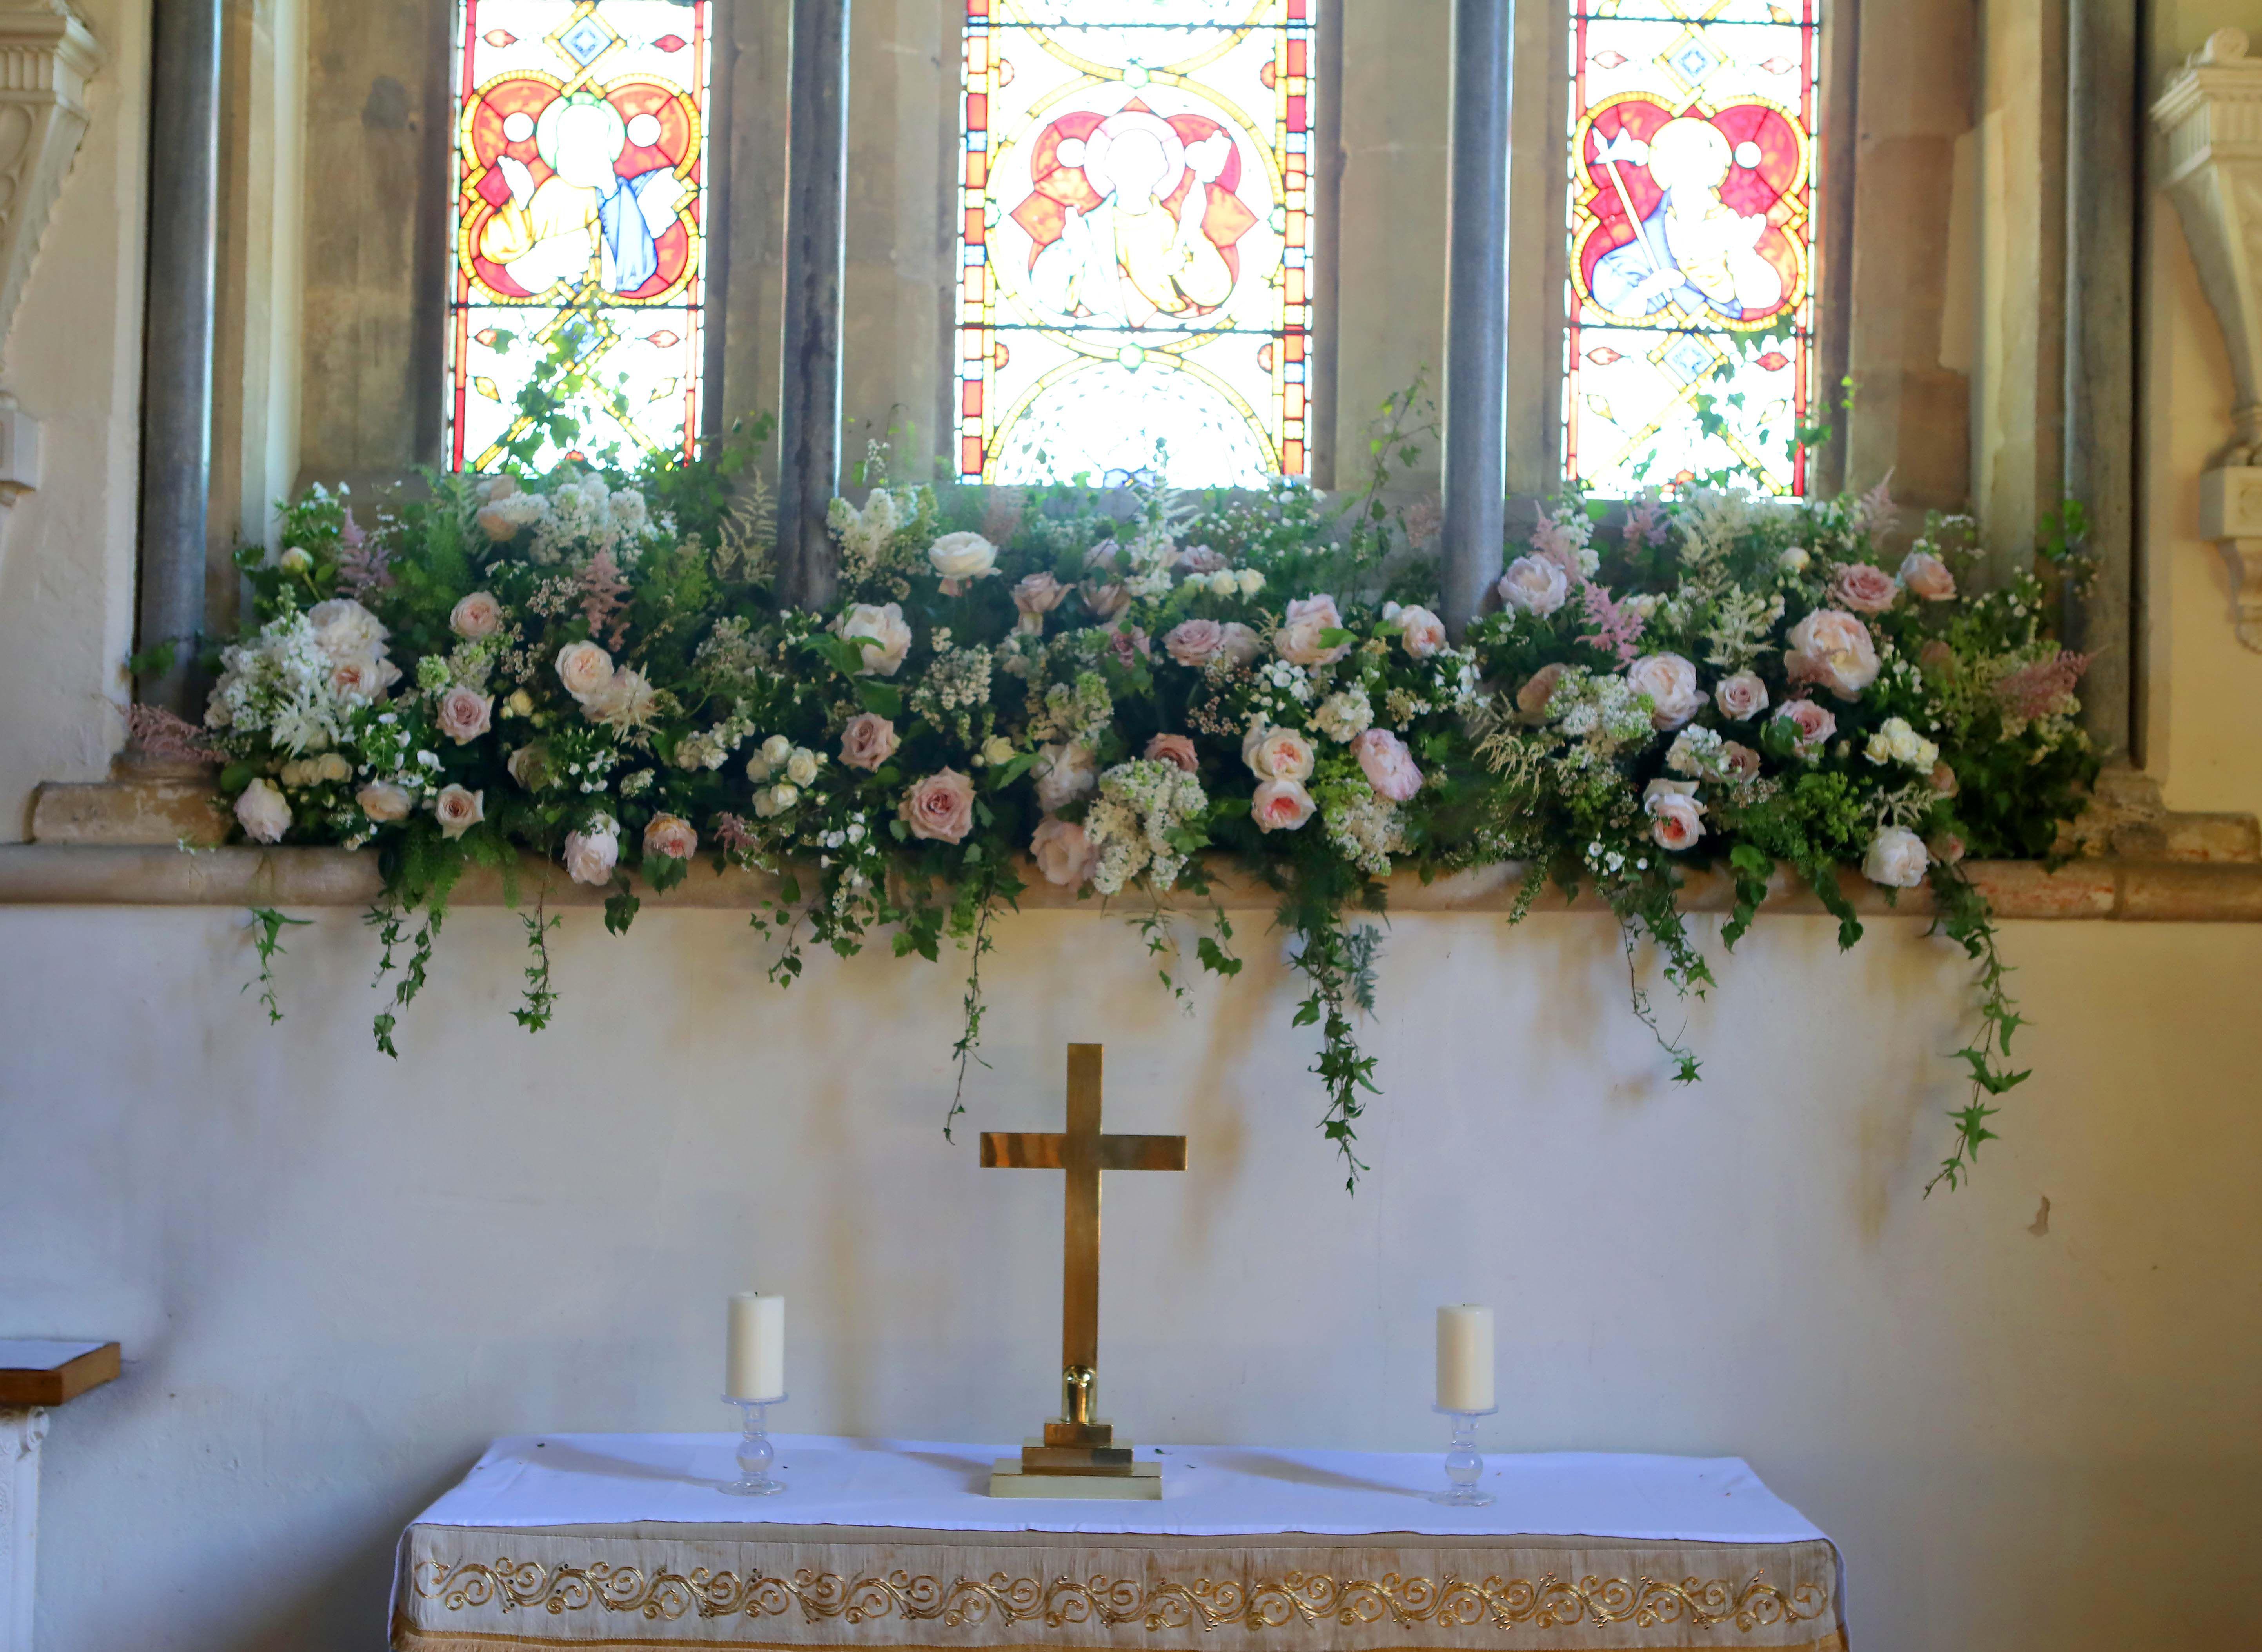 Pippa Middleton Wedding Flowers S Beautiful Flower Arrangements At St Mark Church